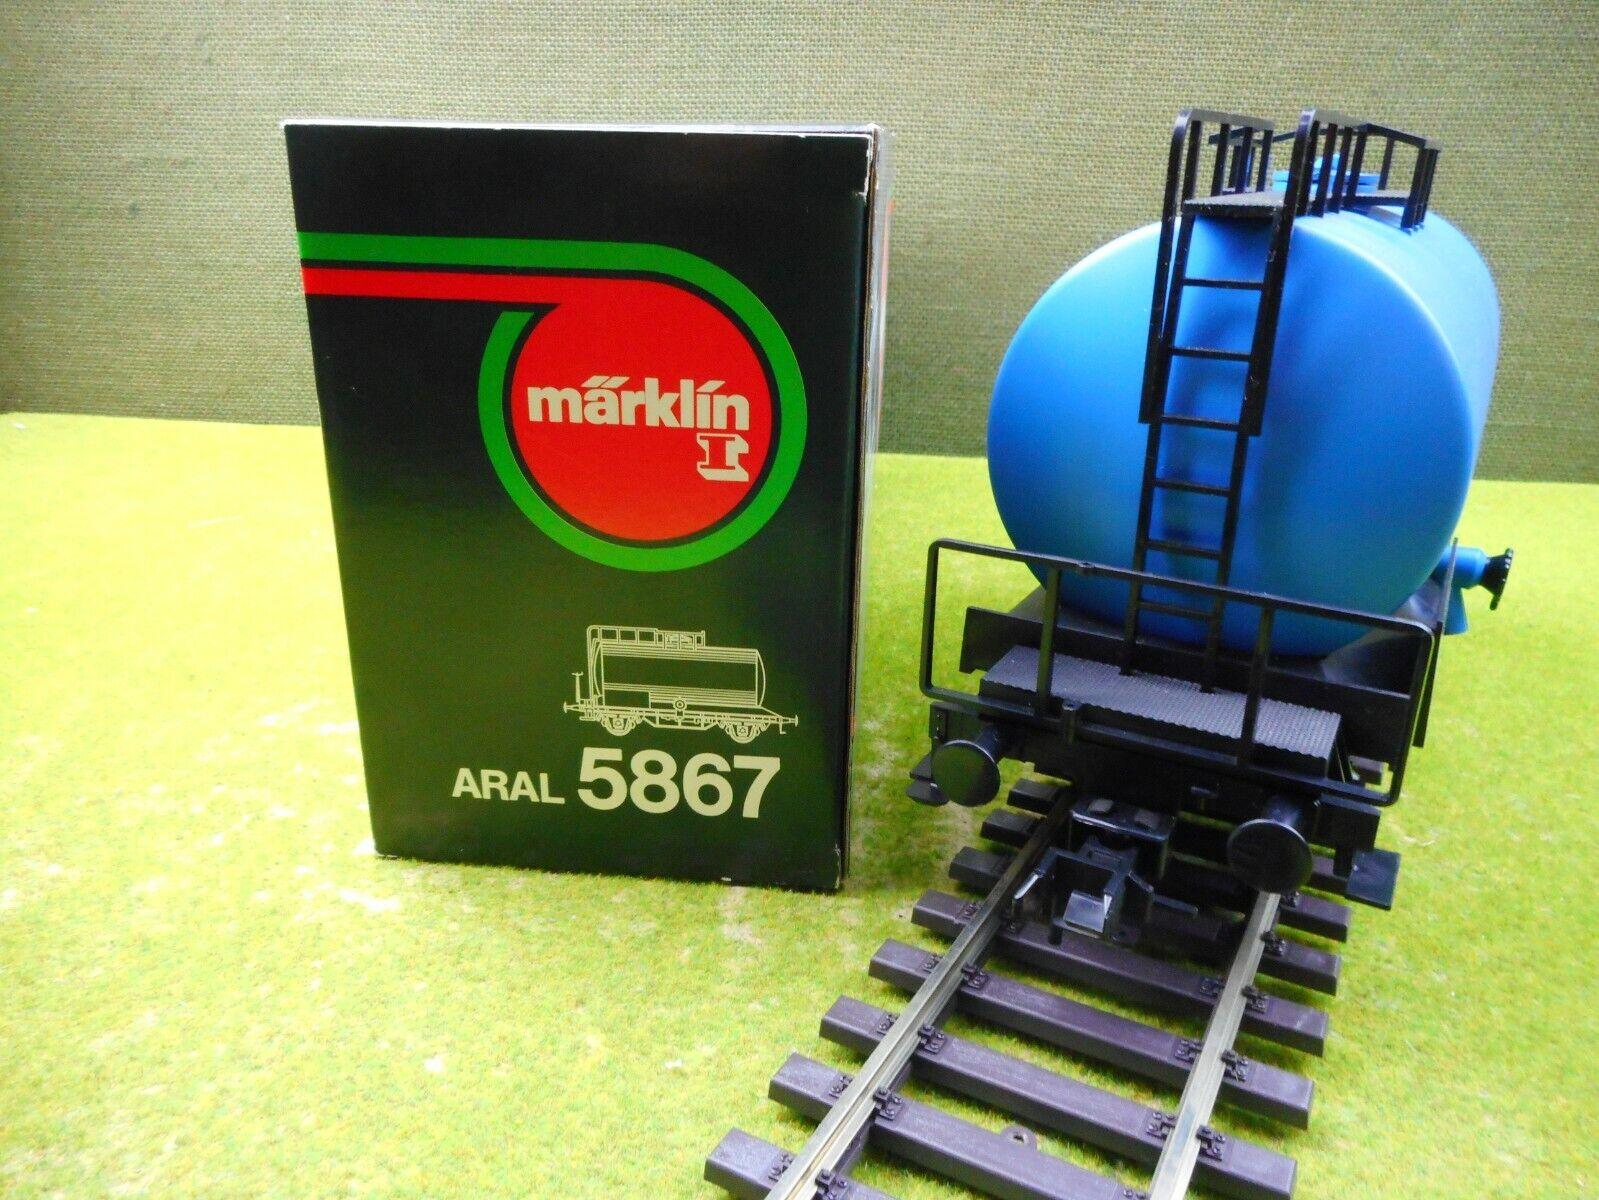 C06 Märklin 5867 traccia 1 carri merci Aral Caldaia Carrello Ovp Top